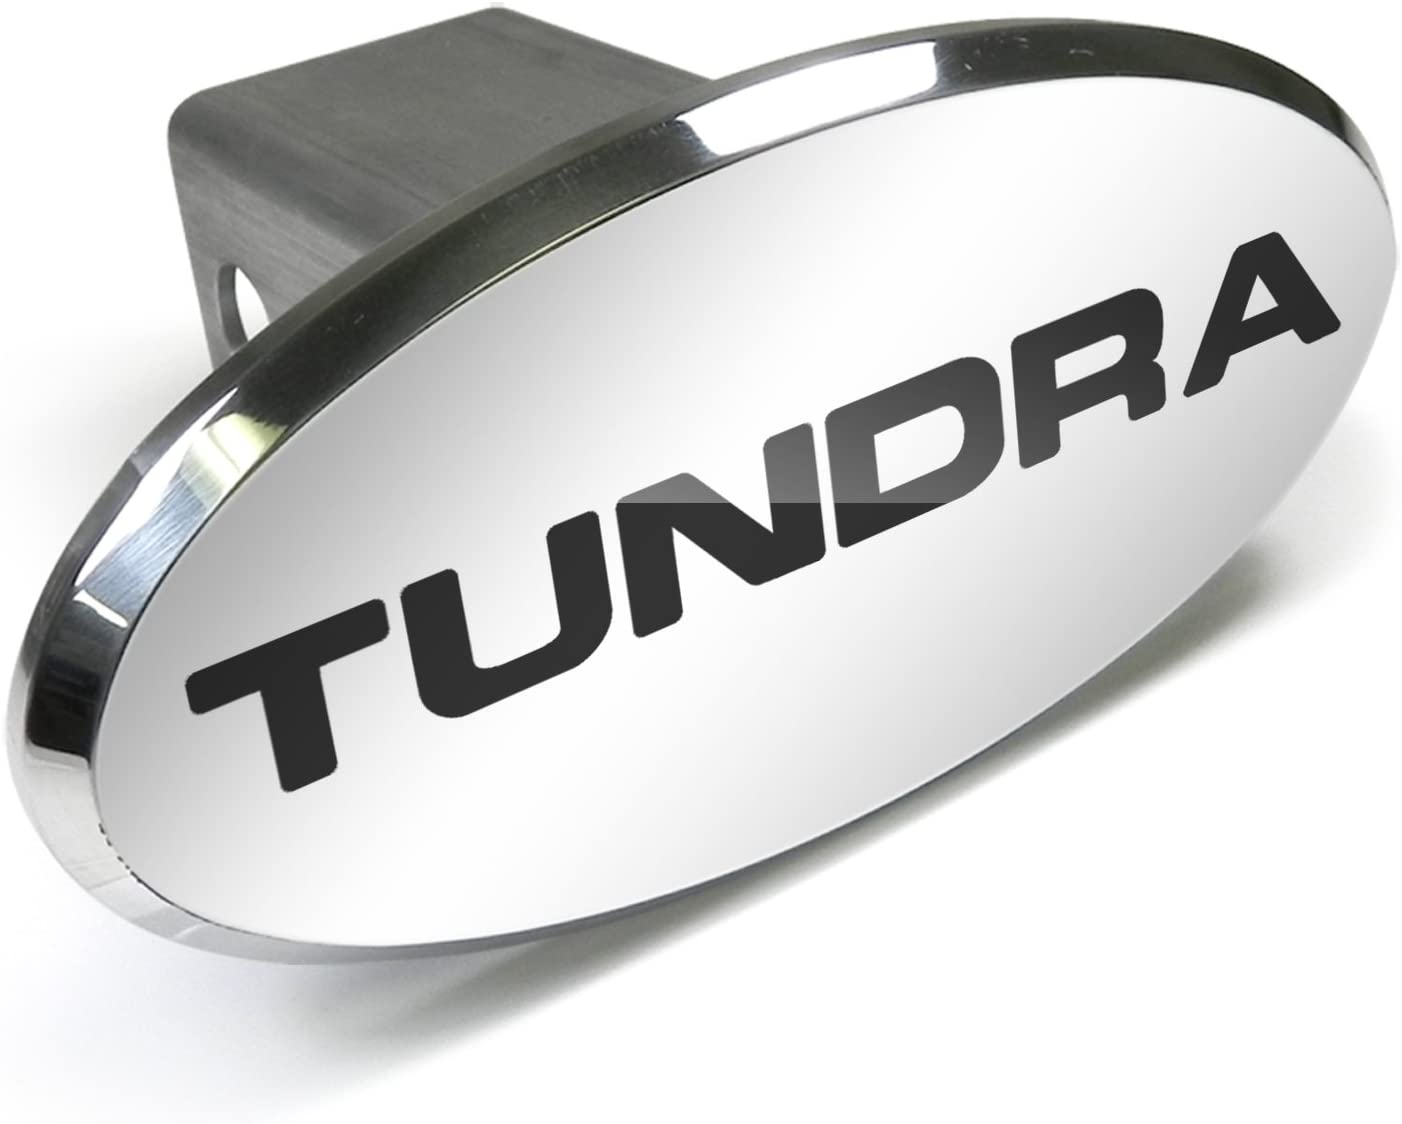 Toyota TRD LED Hitch Cover Black Version